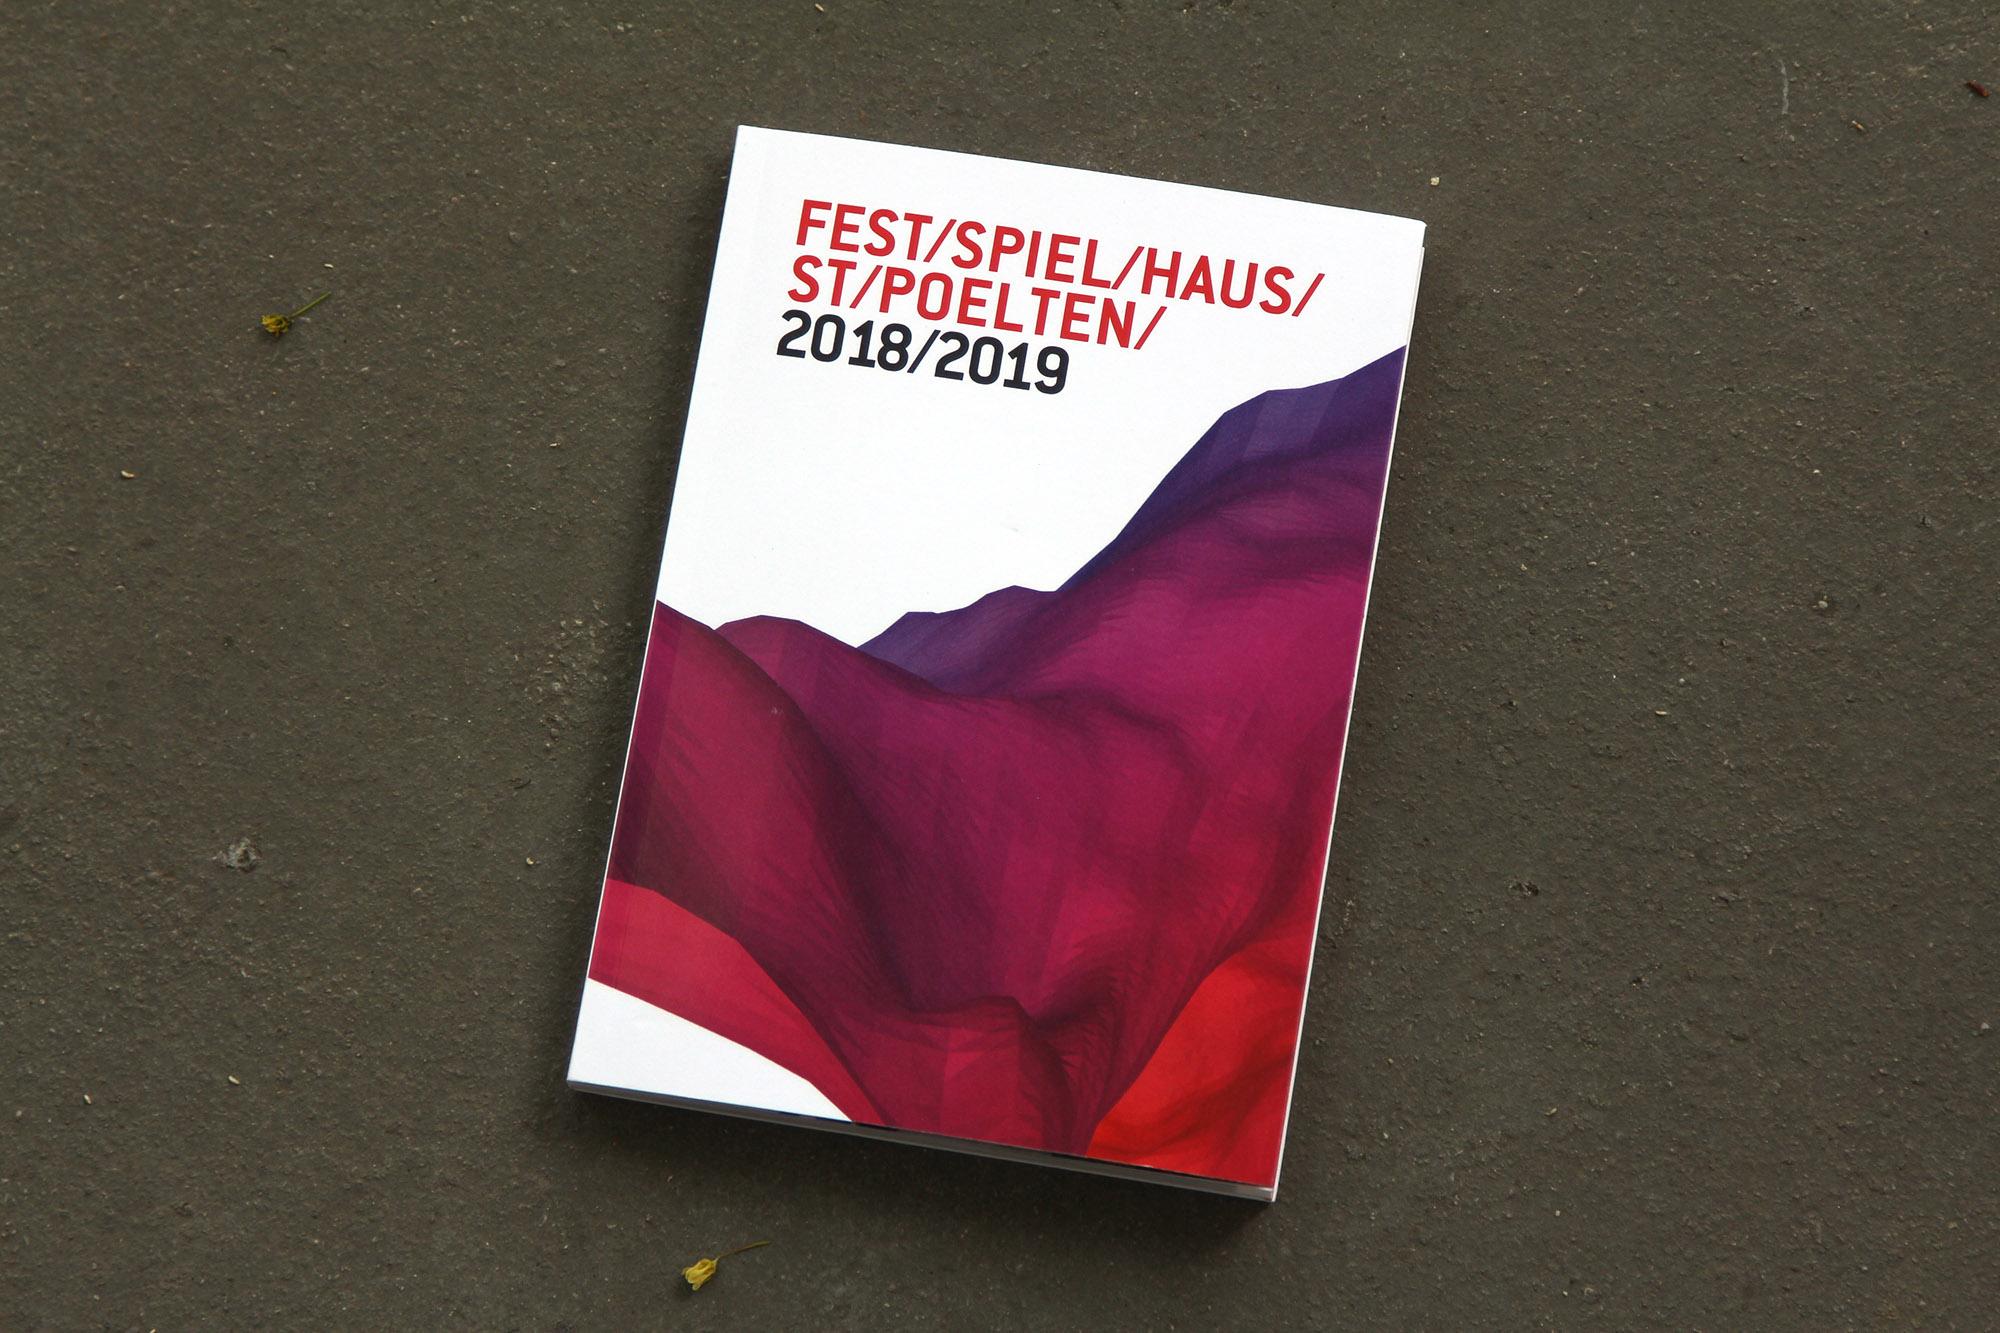 festspielhaus_st-poelten_brochure_process